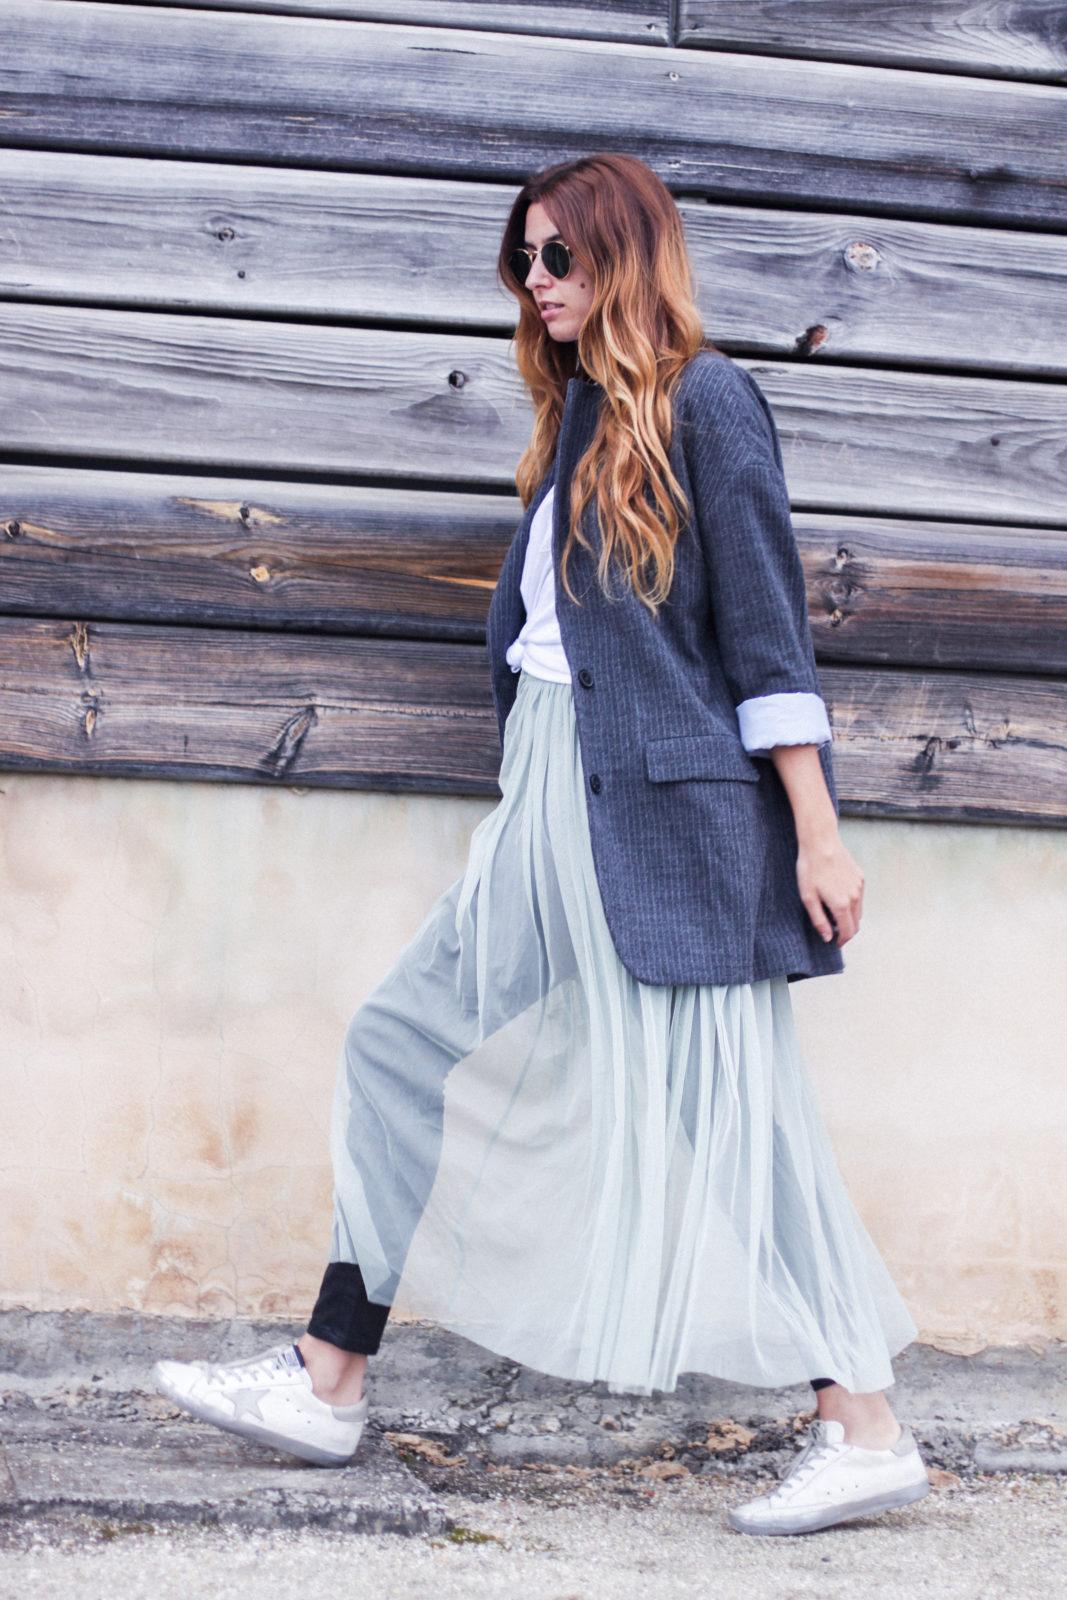 vestido_de_tul_sobre_pantalon_estilo_bailarina_blazer_oversize_pendientes_de_aros_choker_tendencias_trends_fall_2016_street_style_donkeycool-15